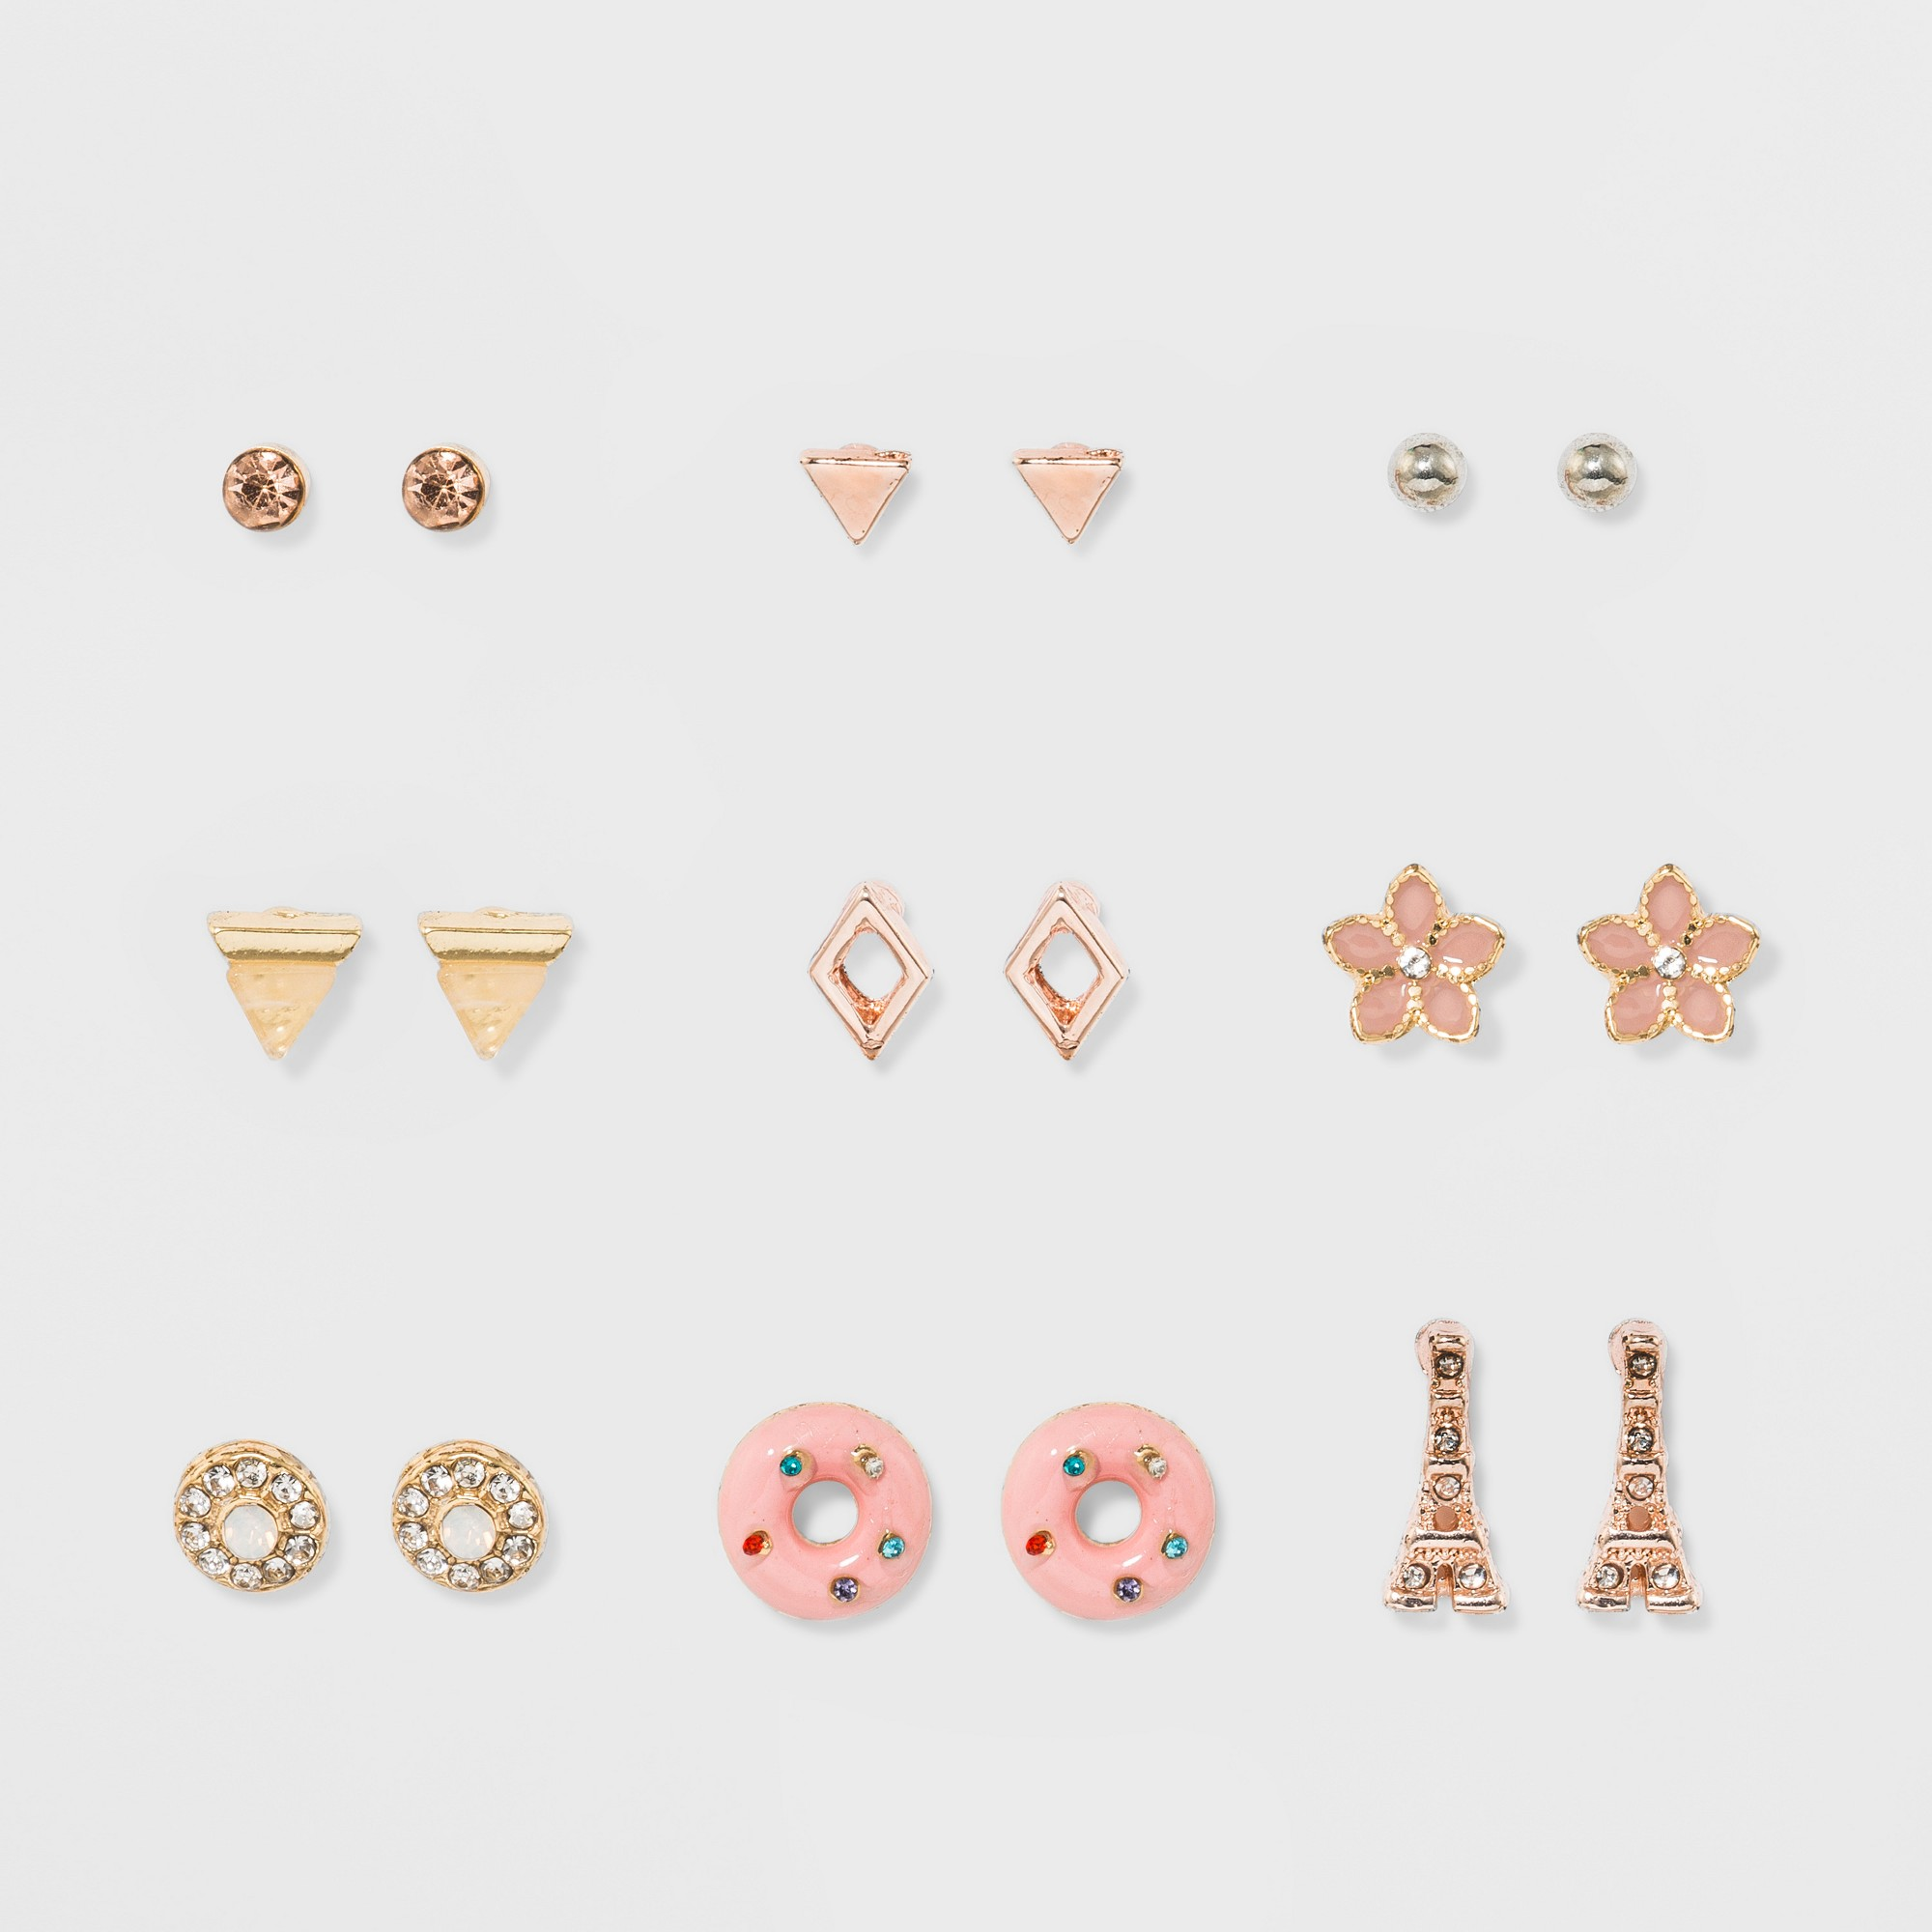 Women's 9pk Earring Set with Flower Eiffel Tower, Multi-Colored